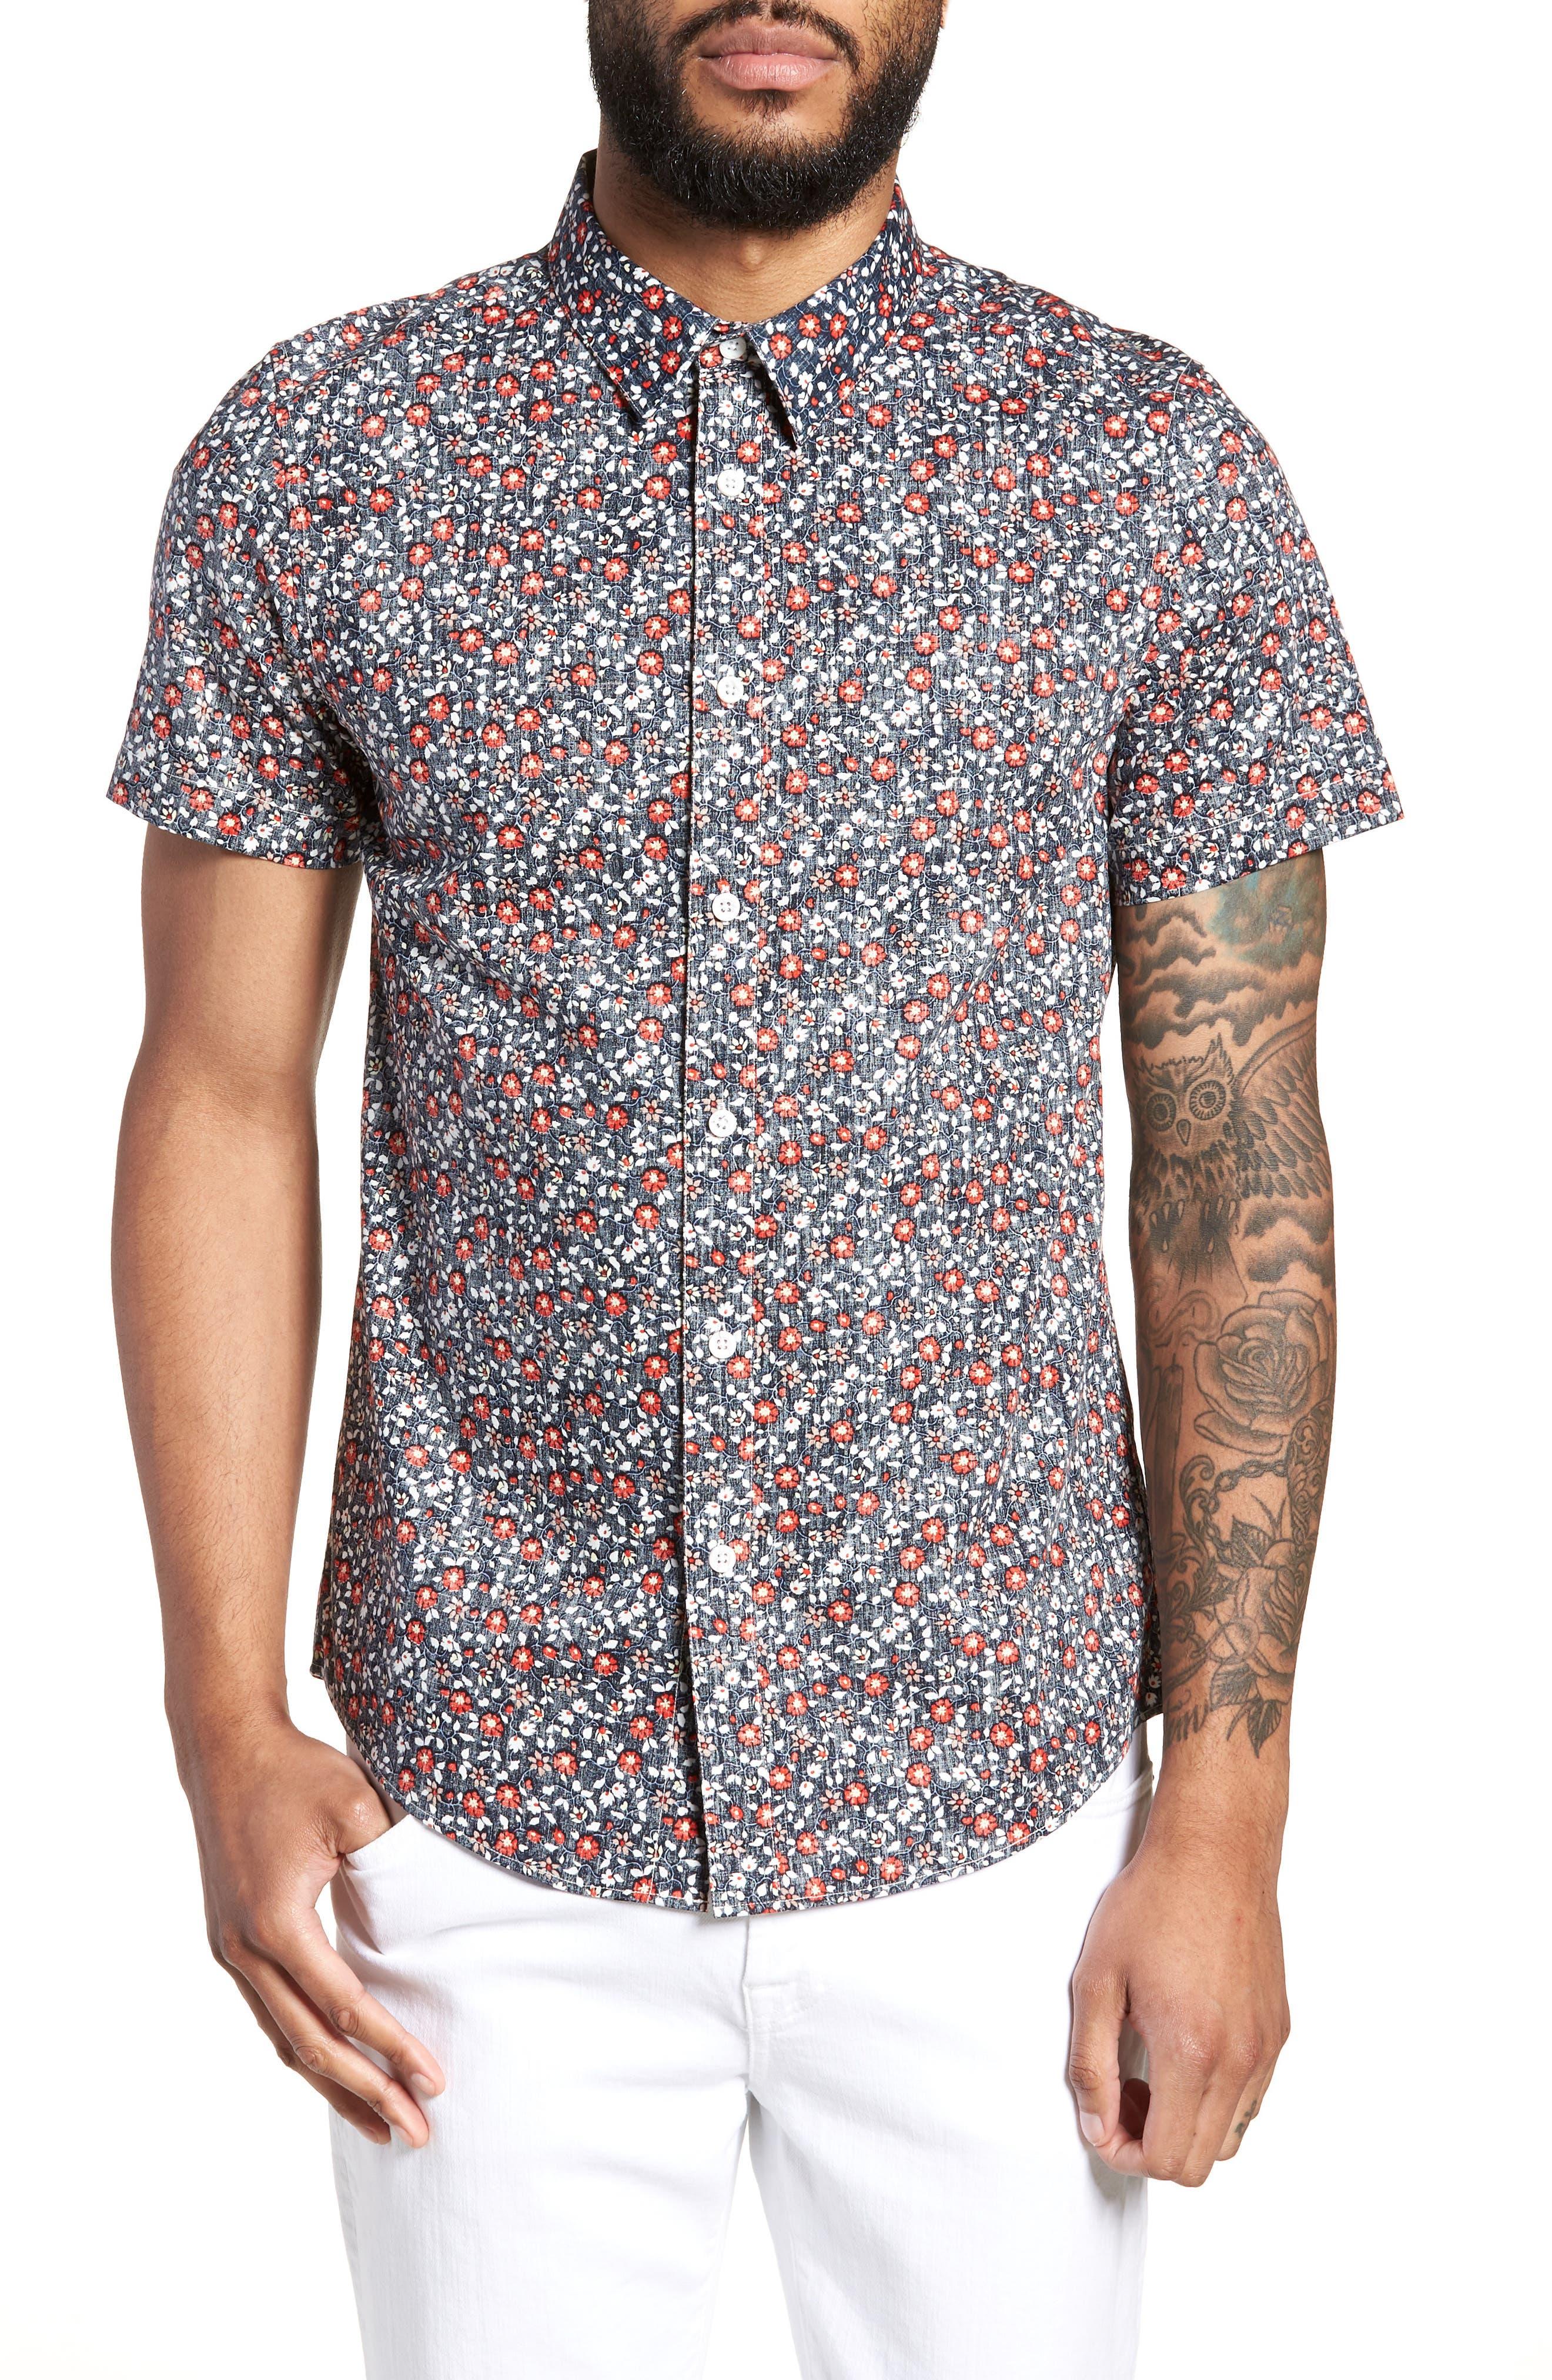 TWENTYMETRICTONS Trim Fit Print Woven Short Sleeve Shirt